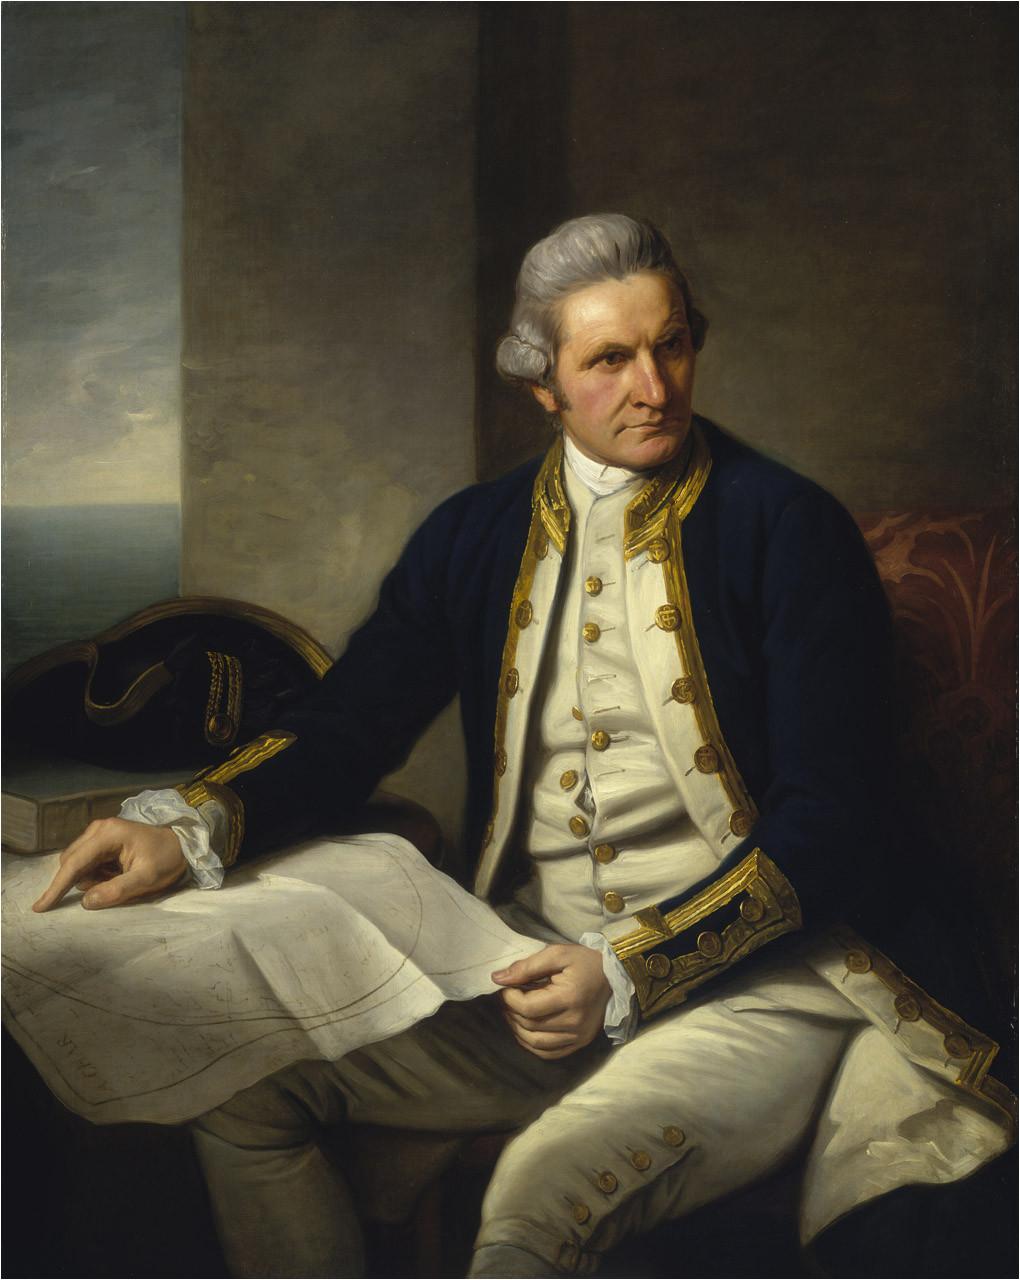 James Cook Lebenslauf Deutsch James Cook –